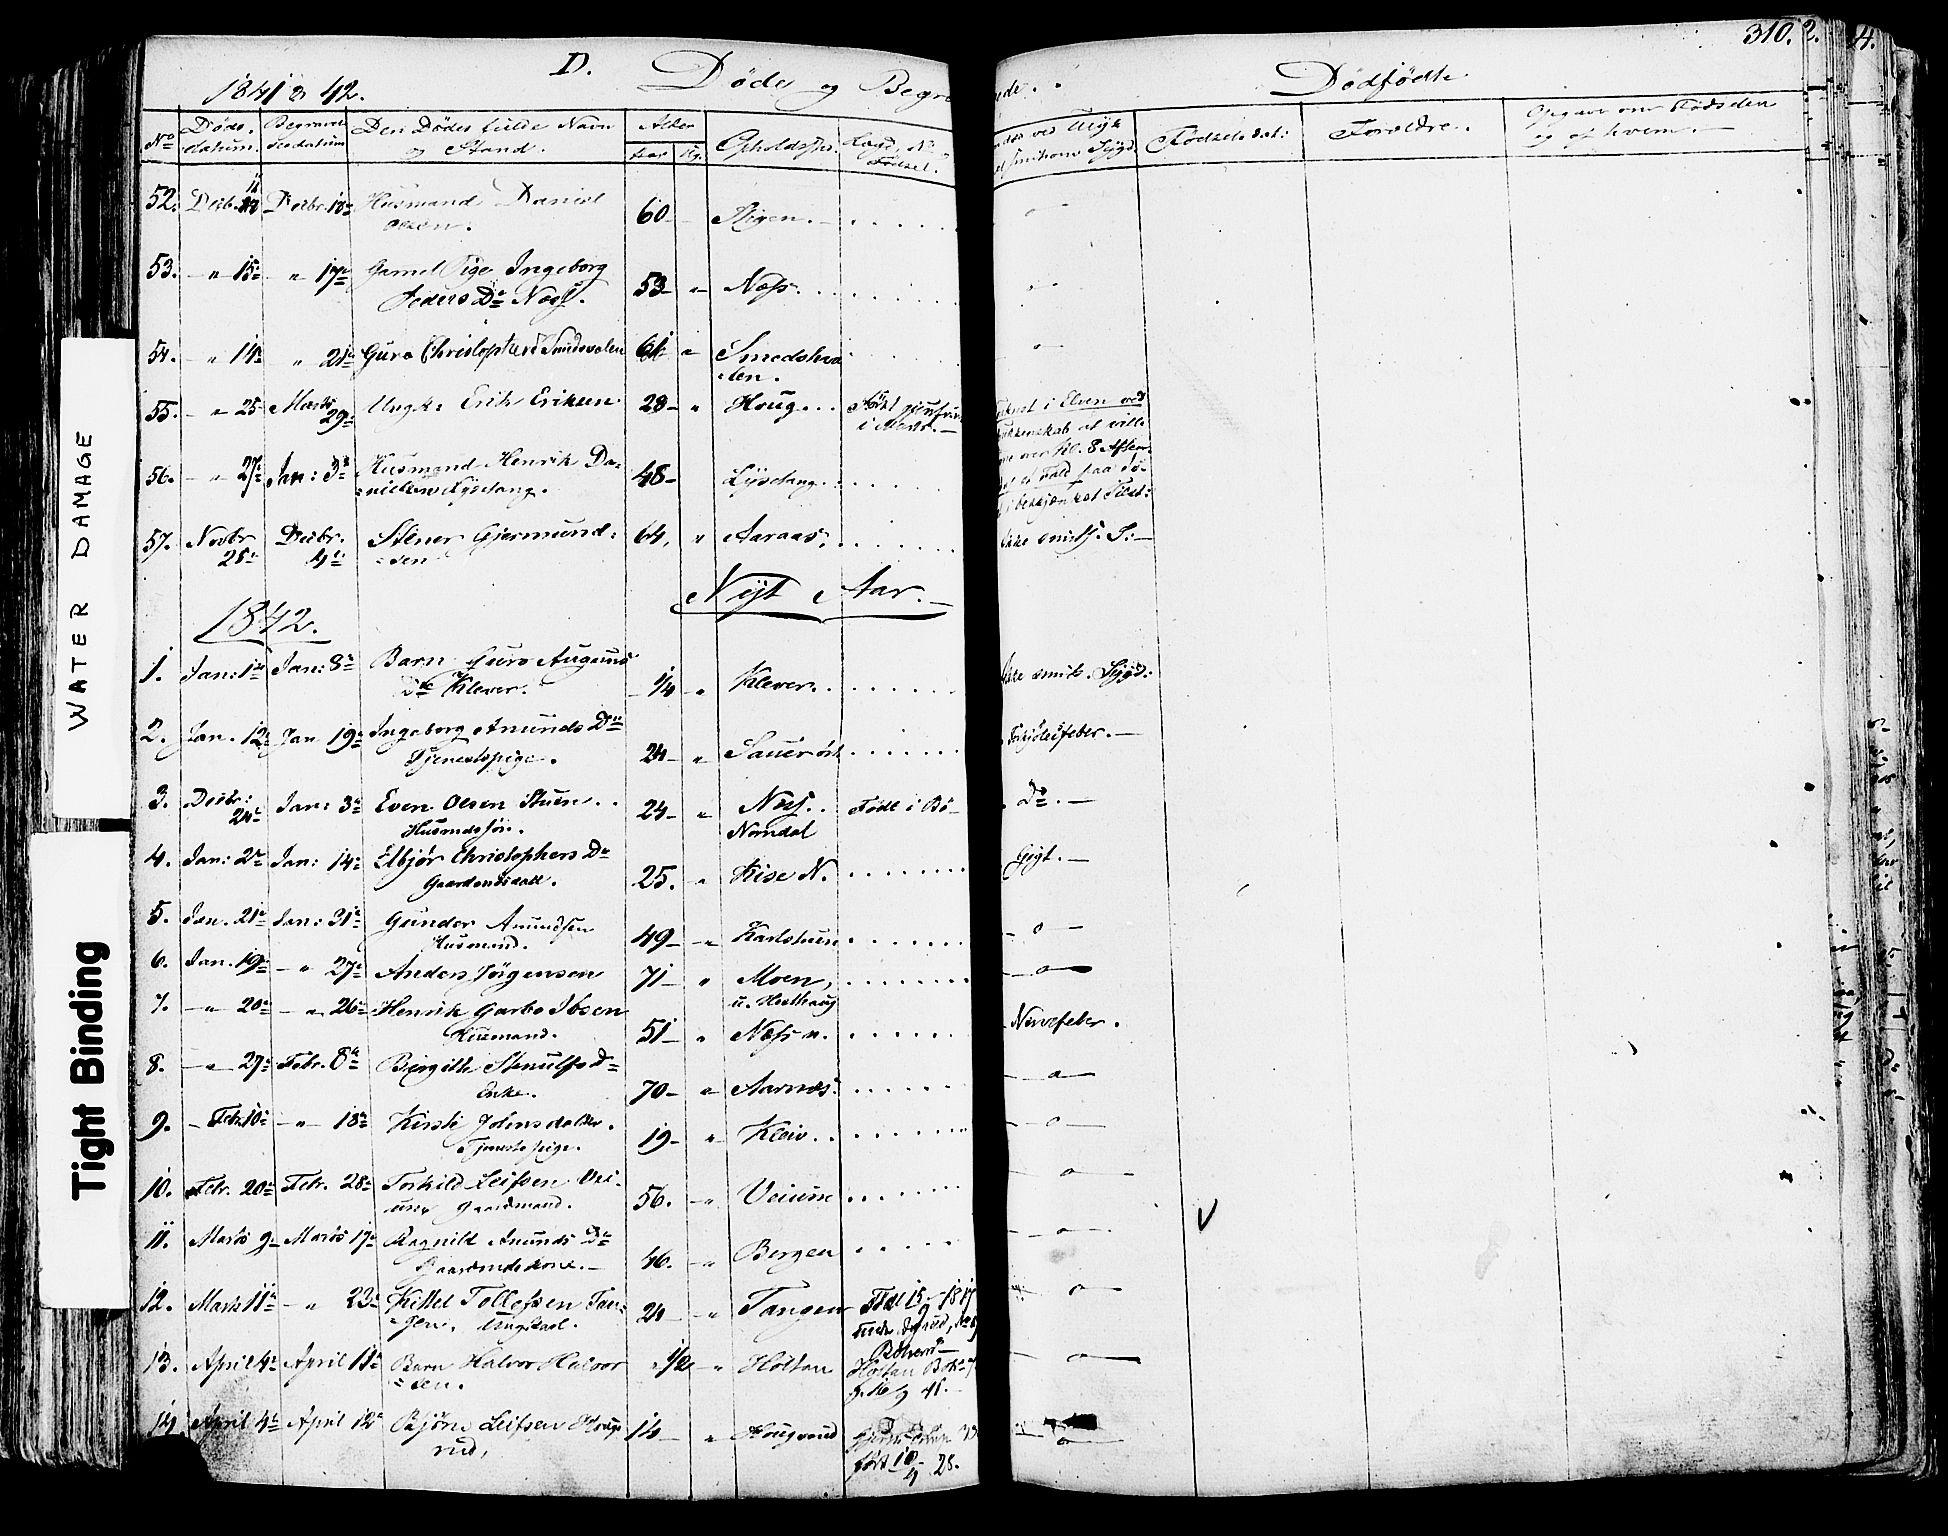 SAKO, Sauherad kirkebøker, F/Fa/L0006: Ministerialbok nr. I 6, 1827-1850, s. 310